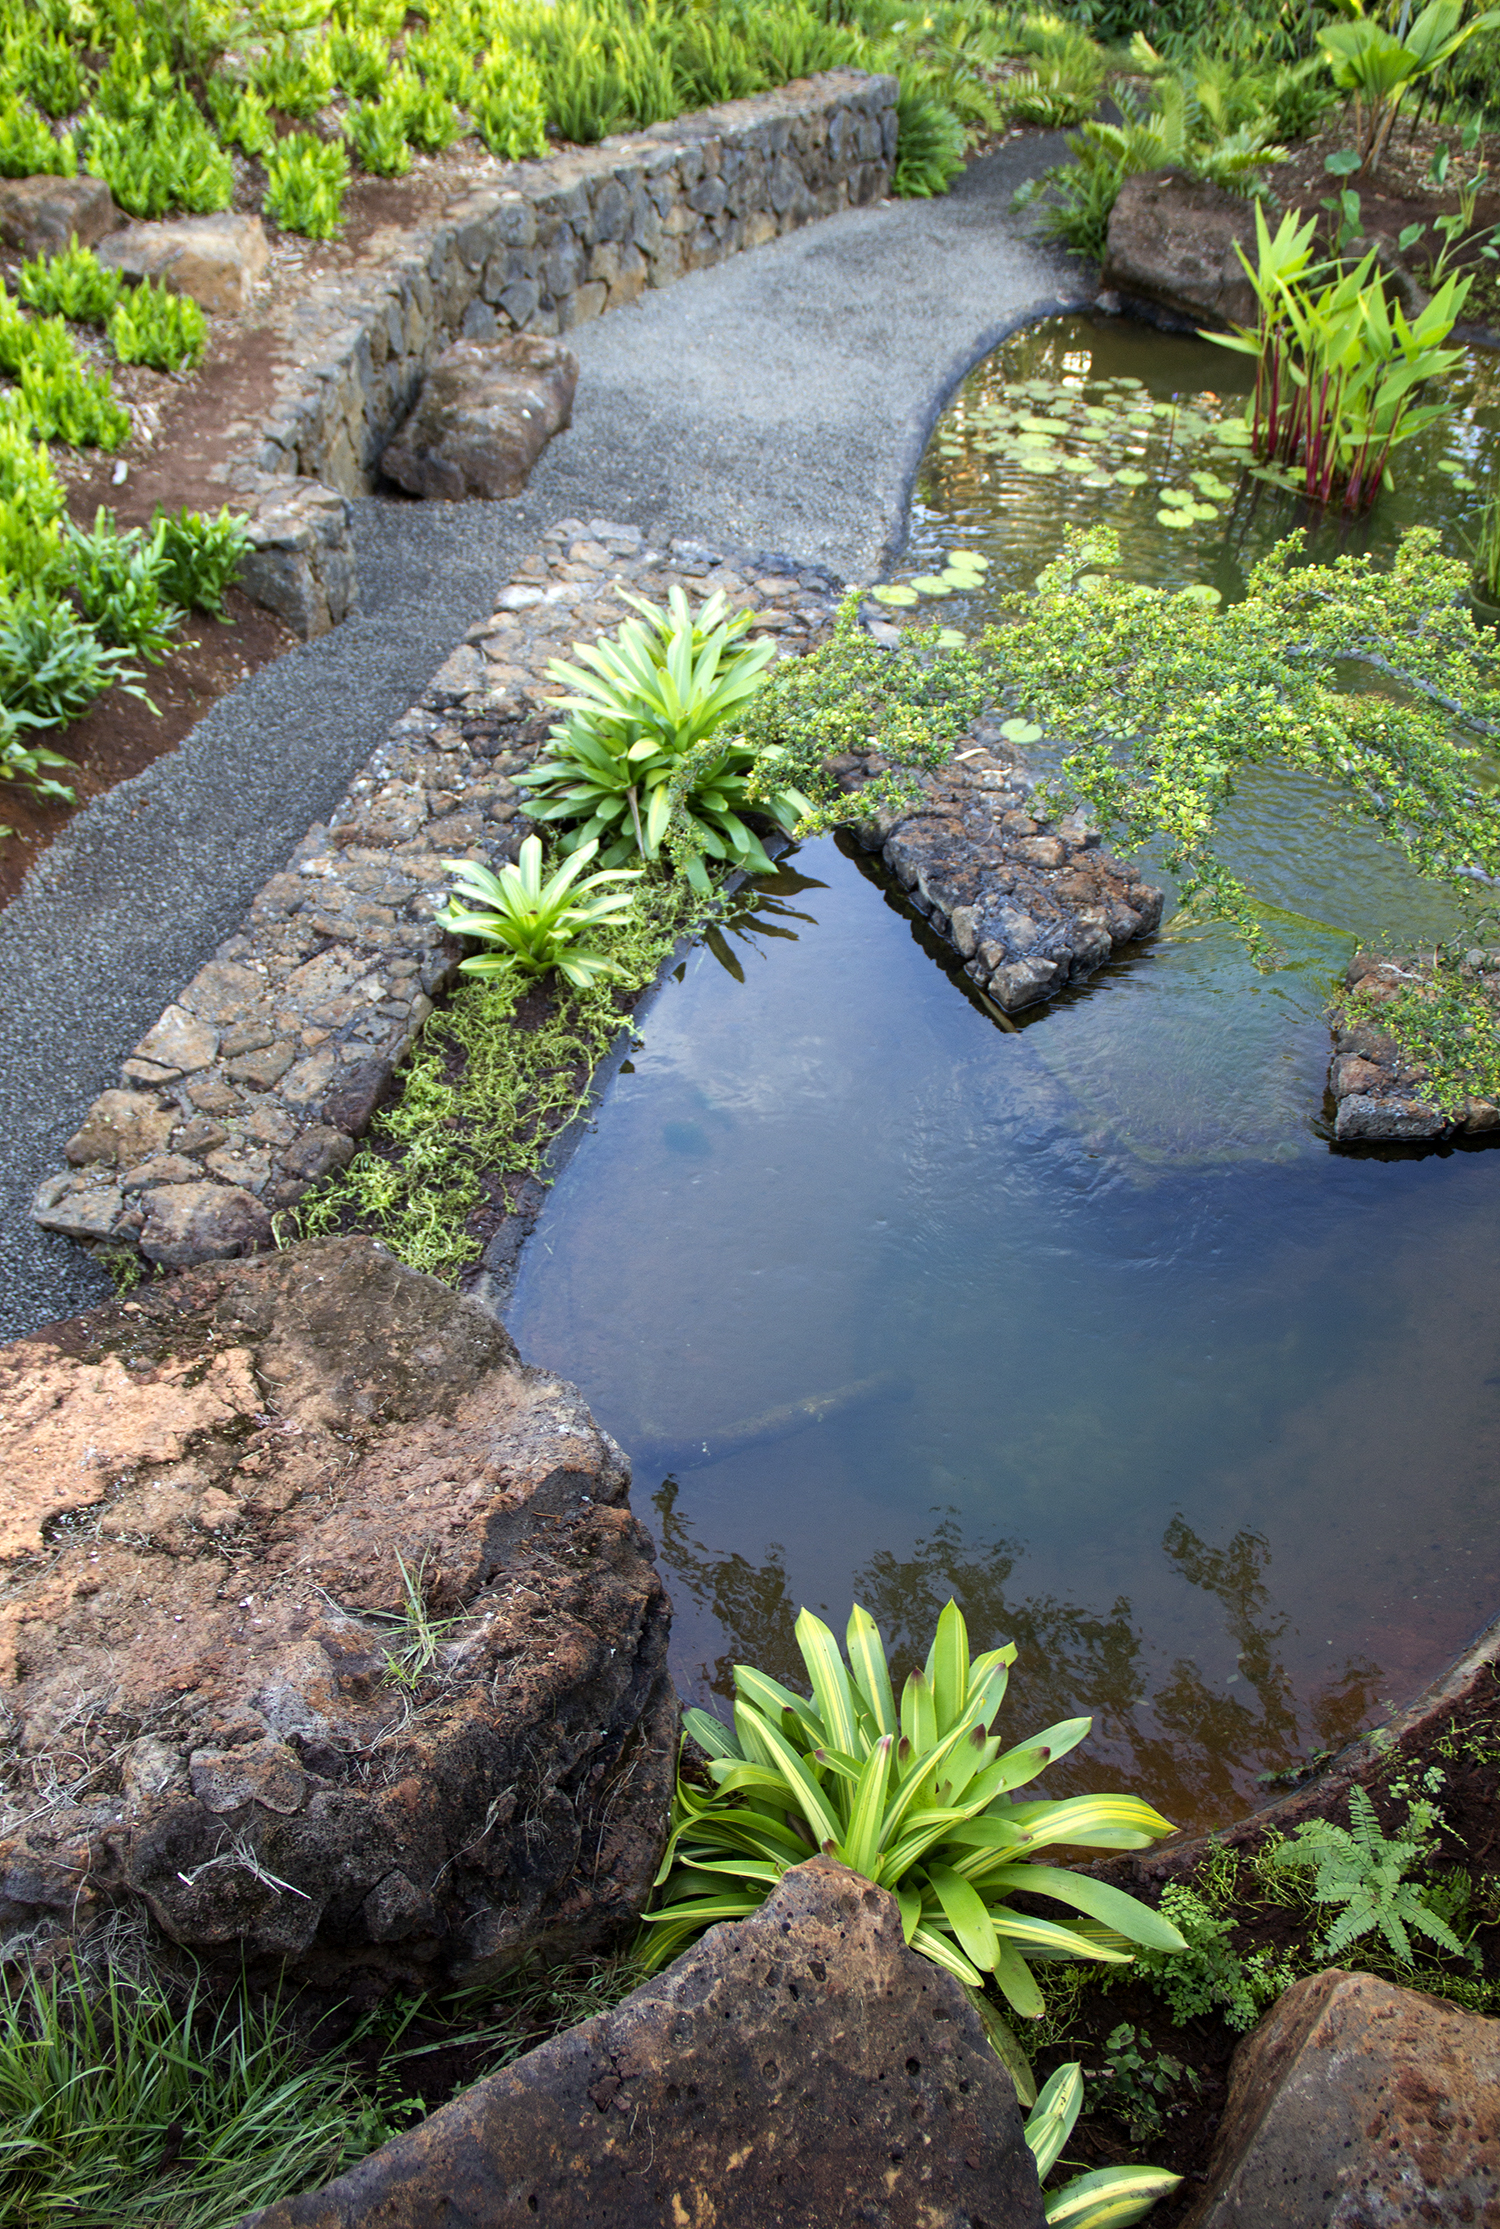 hut-house-water-garden-4.jpg